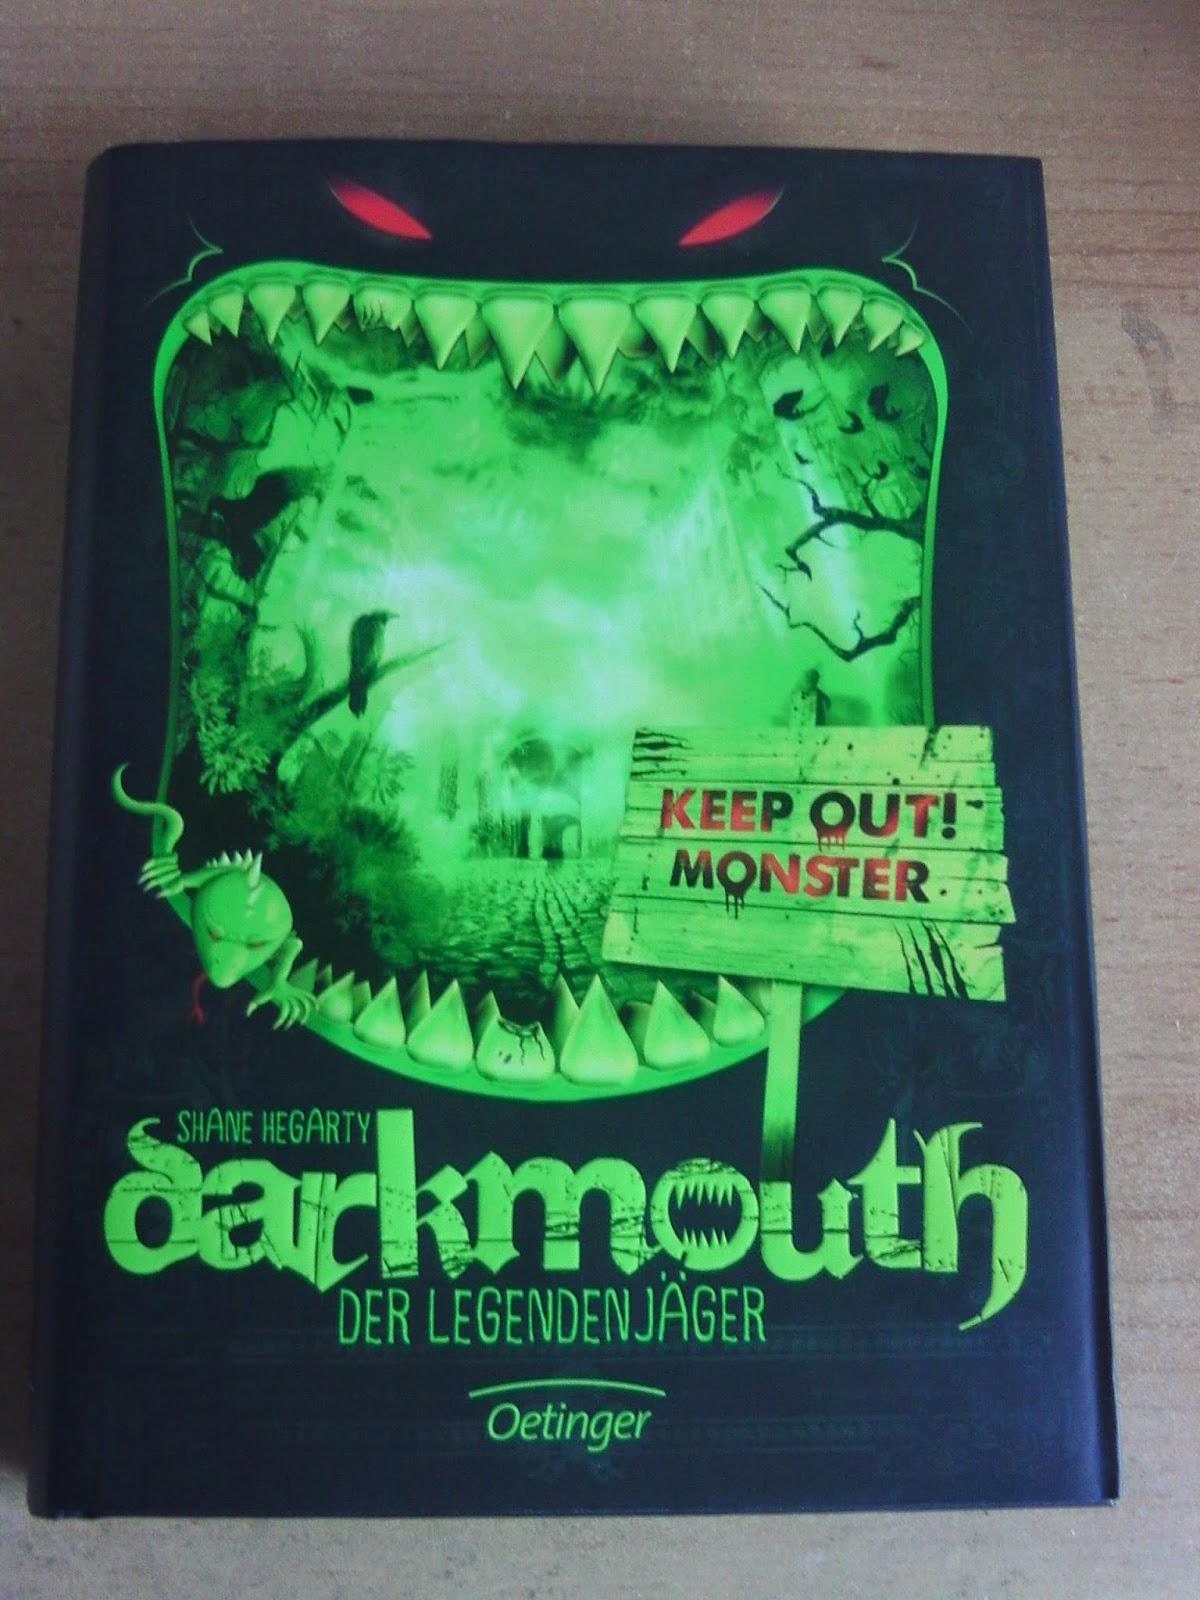 http://www.amazon.de/Darkmouth-Legendenj%C3%A4ger-Band-Shane-Hegarty/dp/3789137251/ref=sr_1_1?s=books&ie=UTF8&qid=1428998139&sr=1-1&keywords=darkmouth+-+der+legendenj%C3%A4ger+1